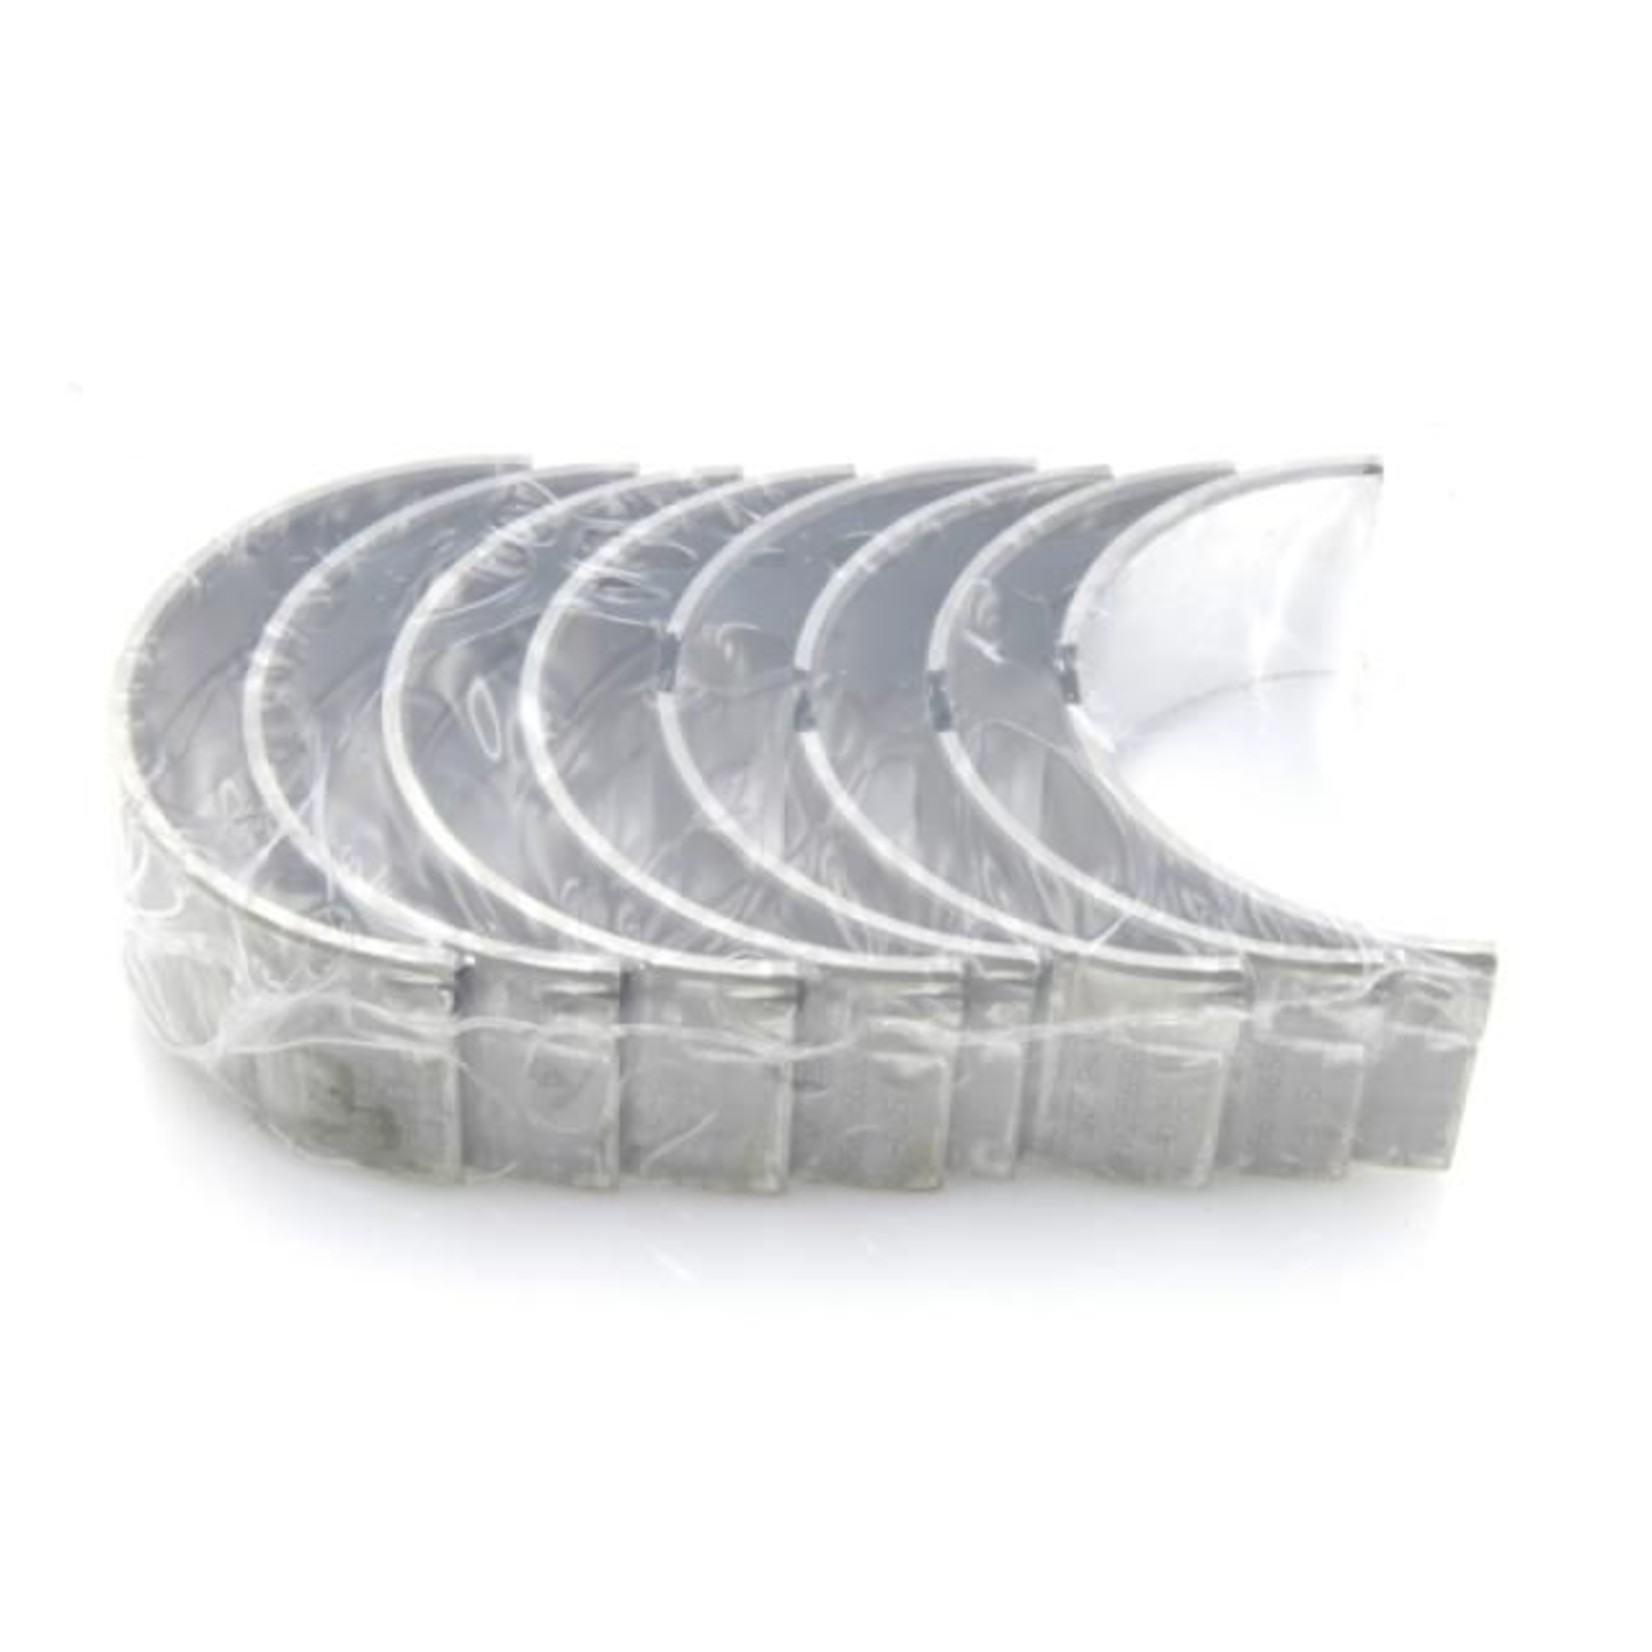 Drijfstanglagers 66- 0,25mm 5 paliers Nr Org: 5454753